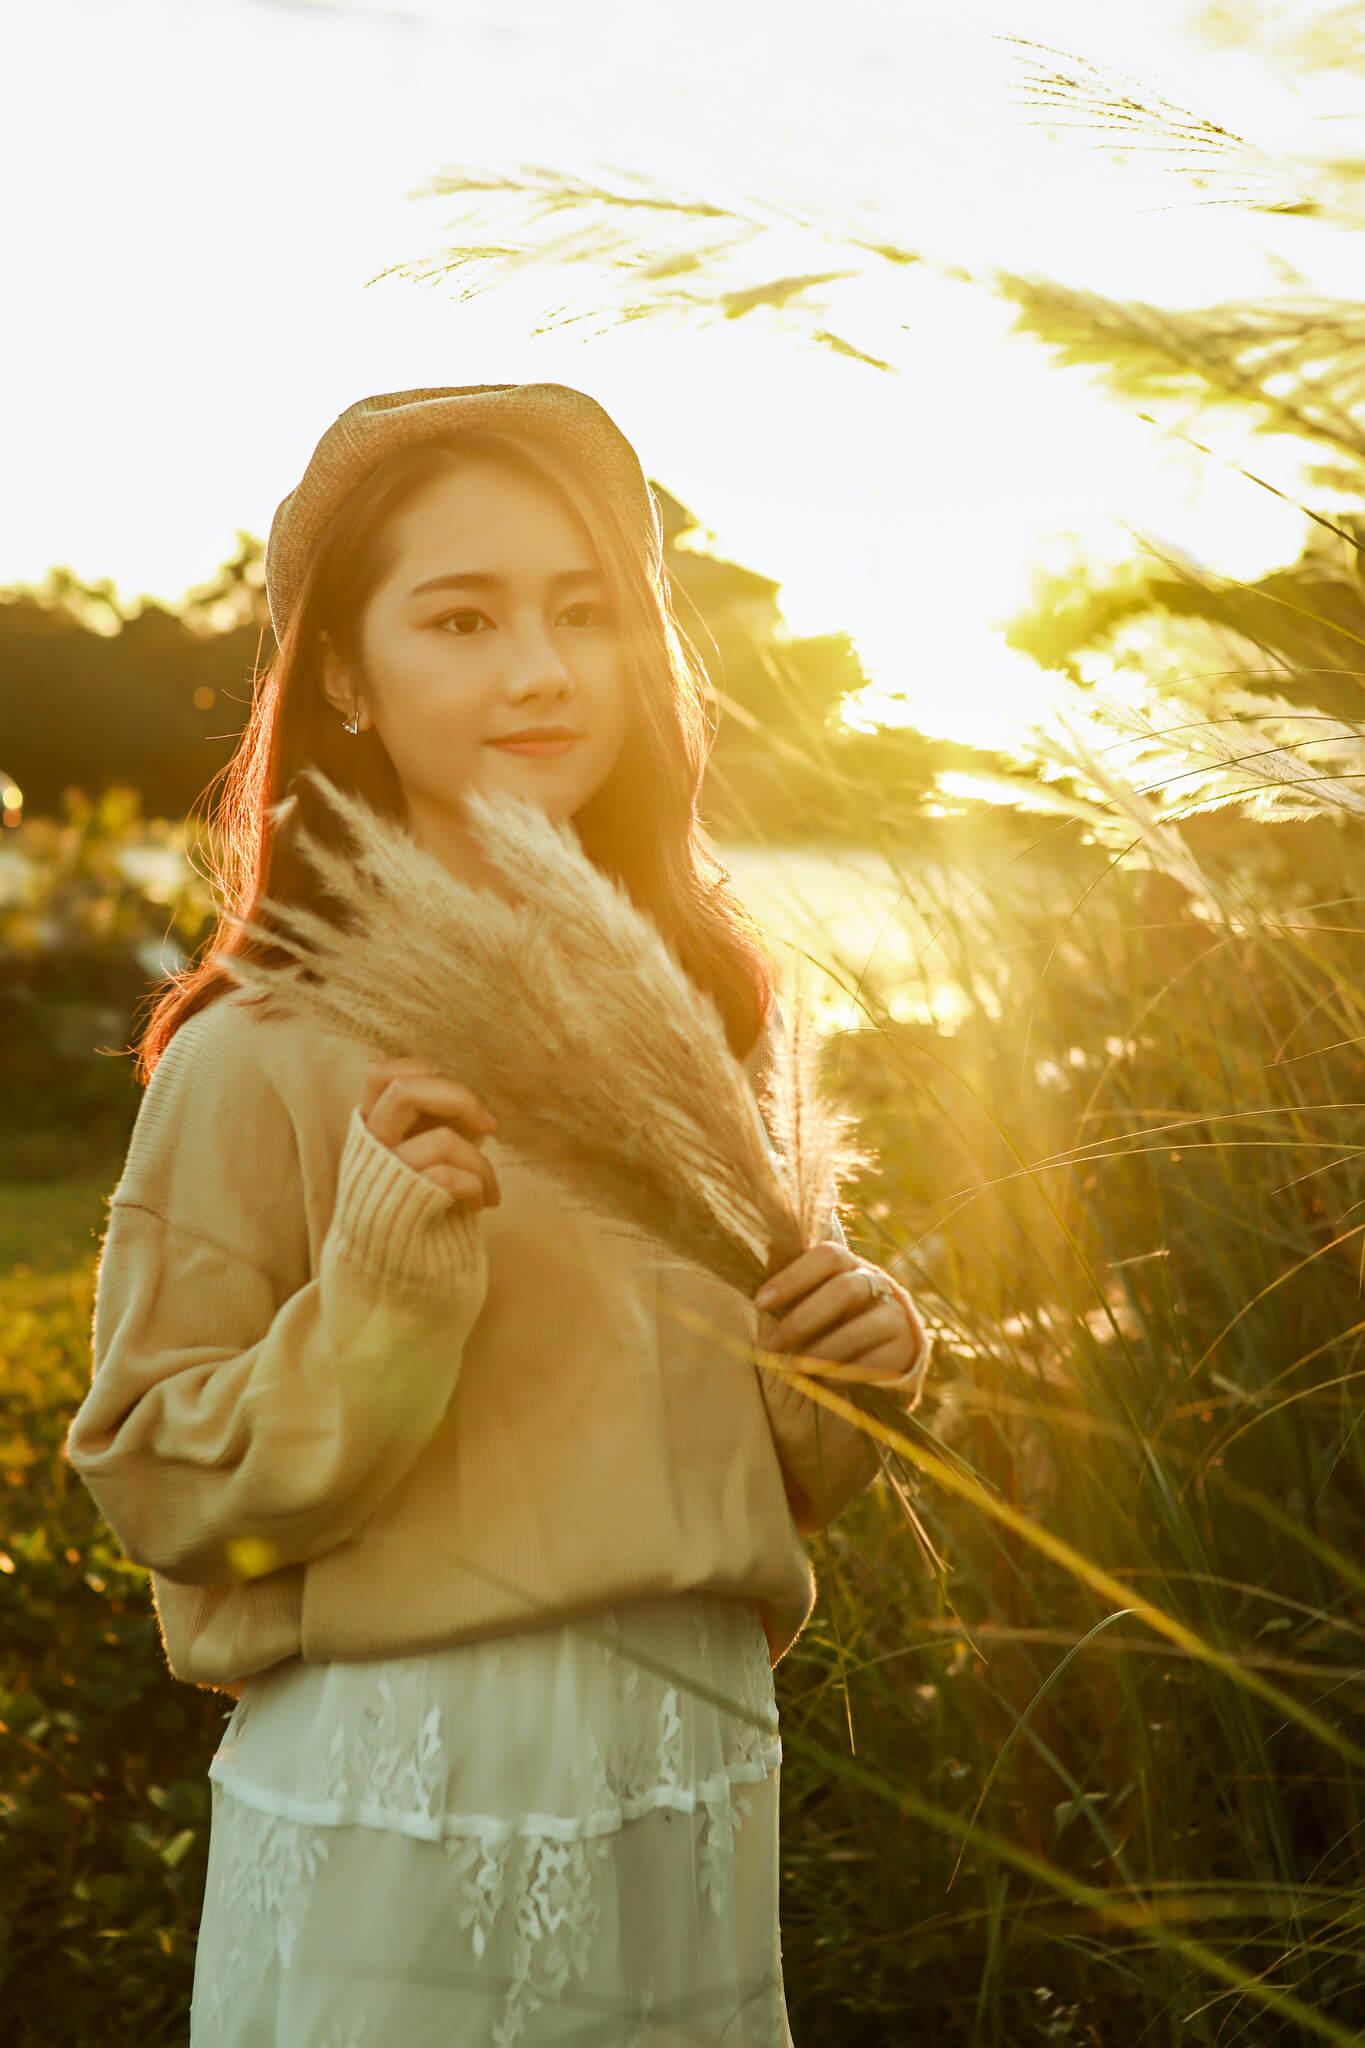 Da Nang Den Hen Lai Len Mua Co Lau Den Roi Danang Fantasticity Com 02